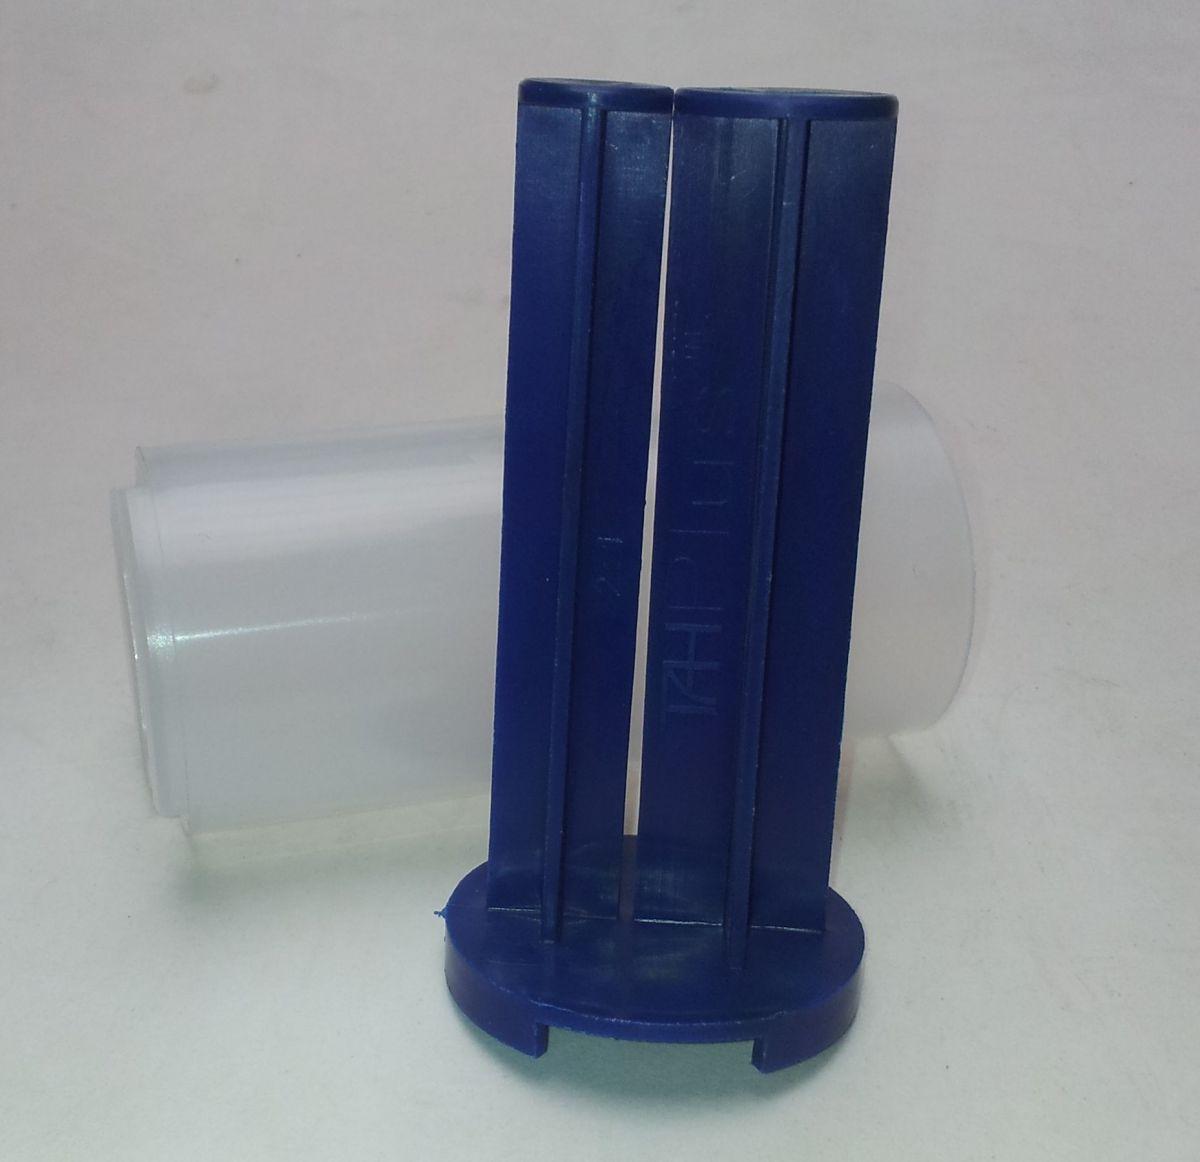 adapterset 21 tbv cartridge 50ml